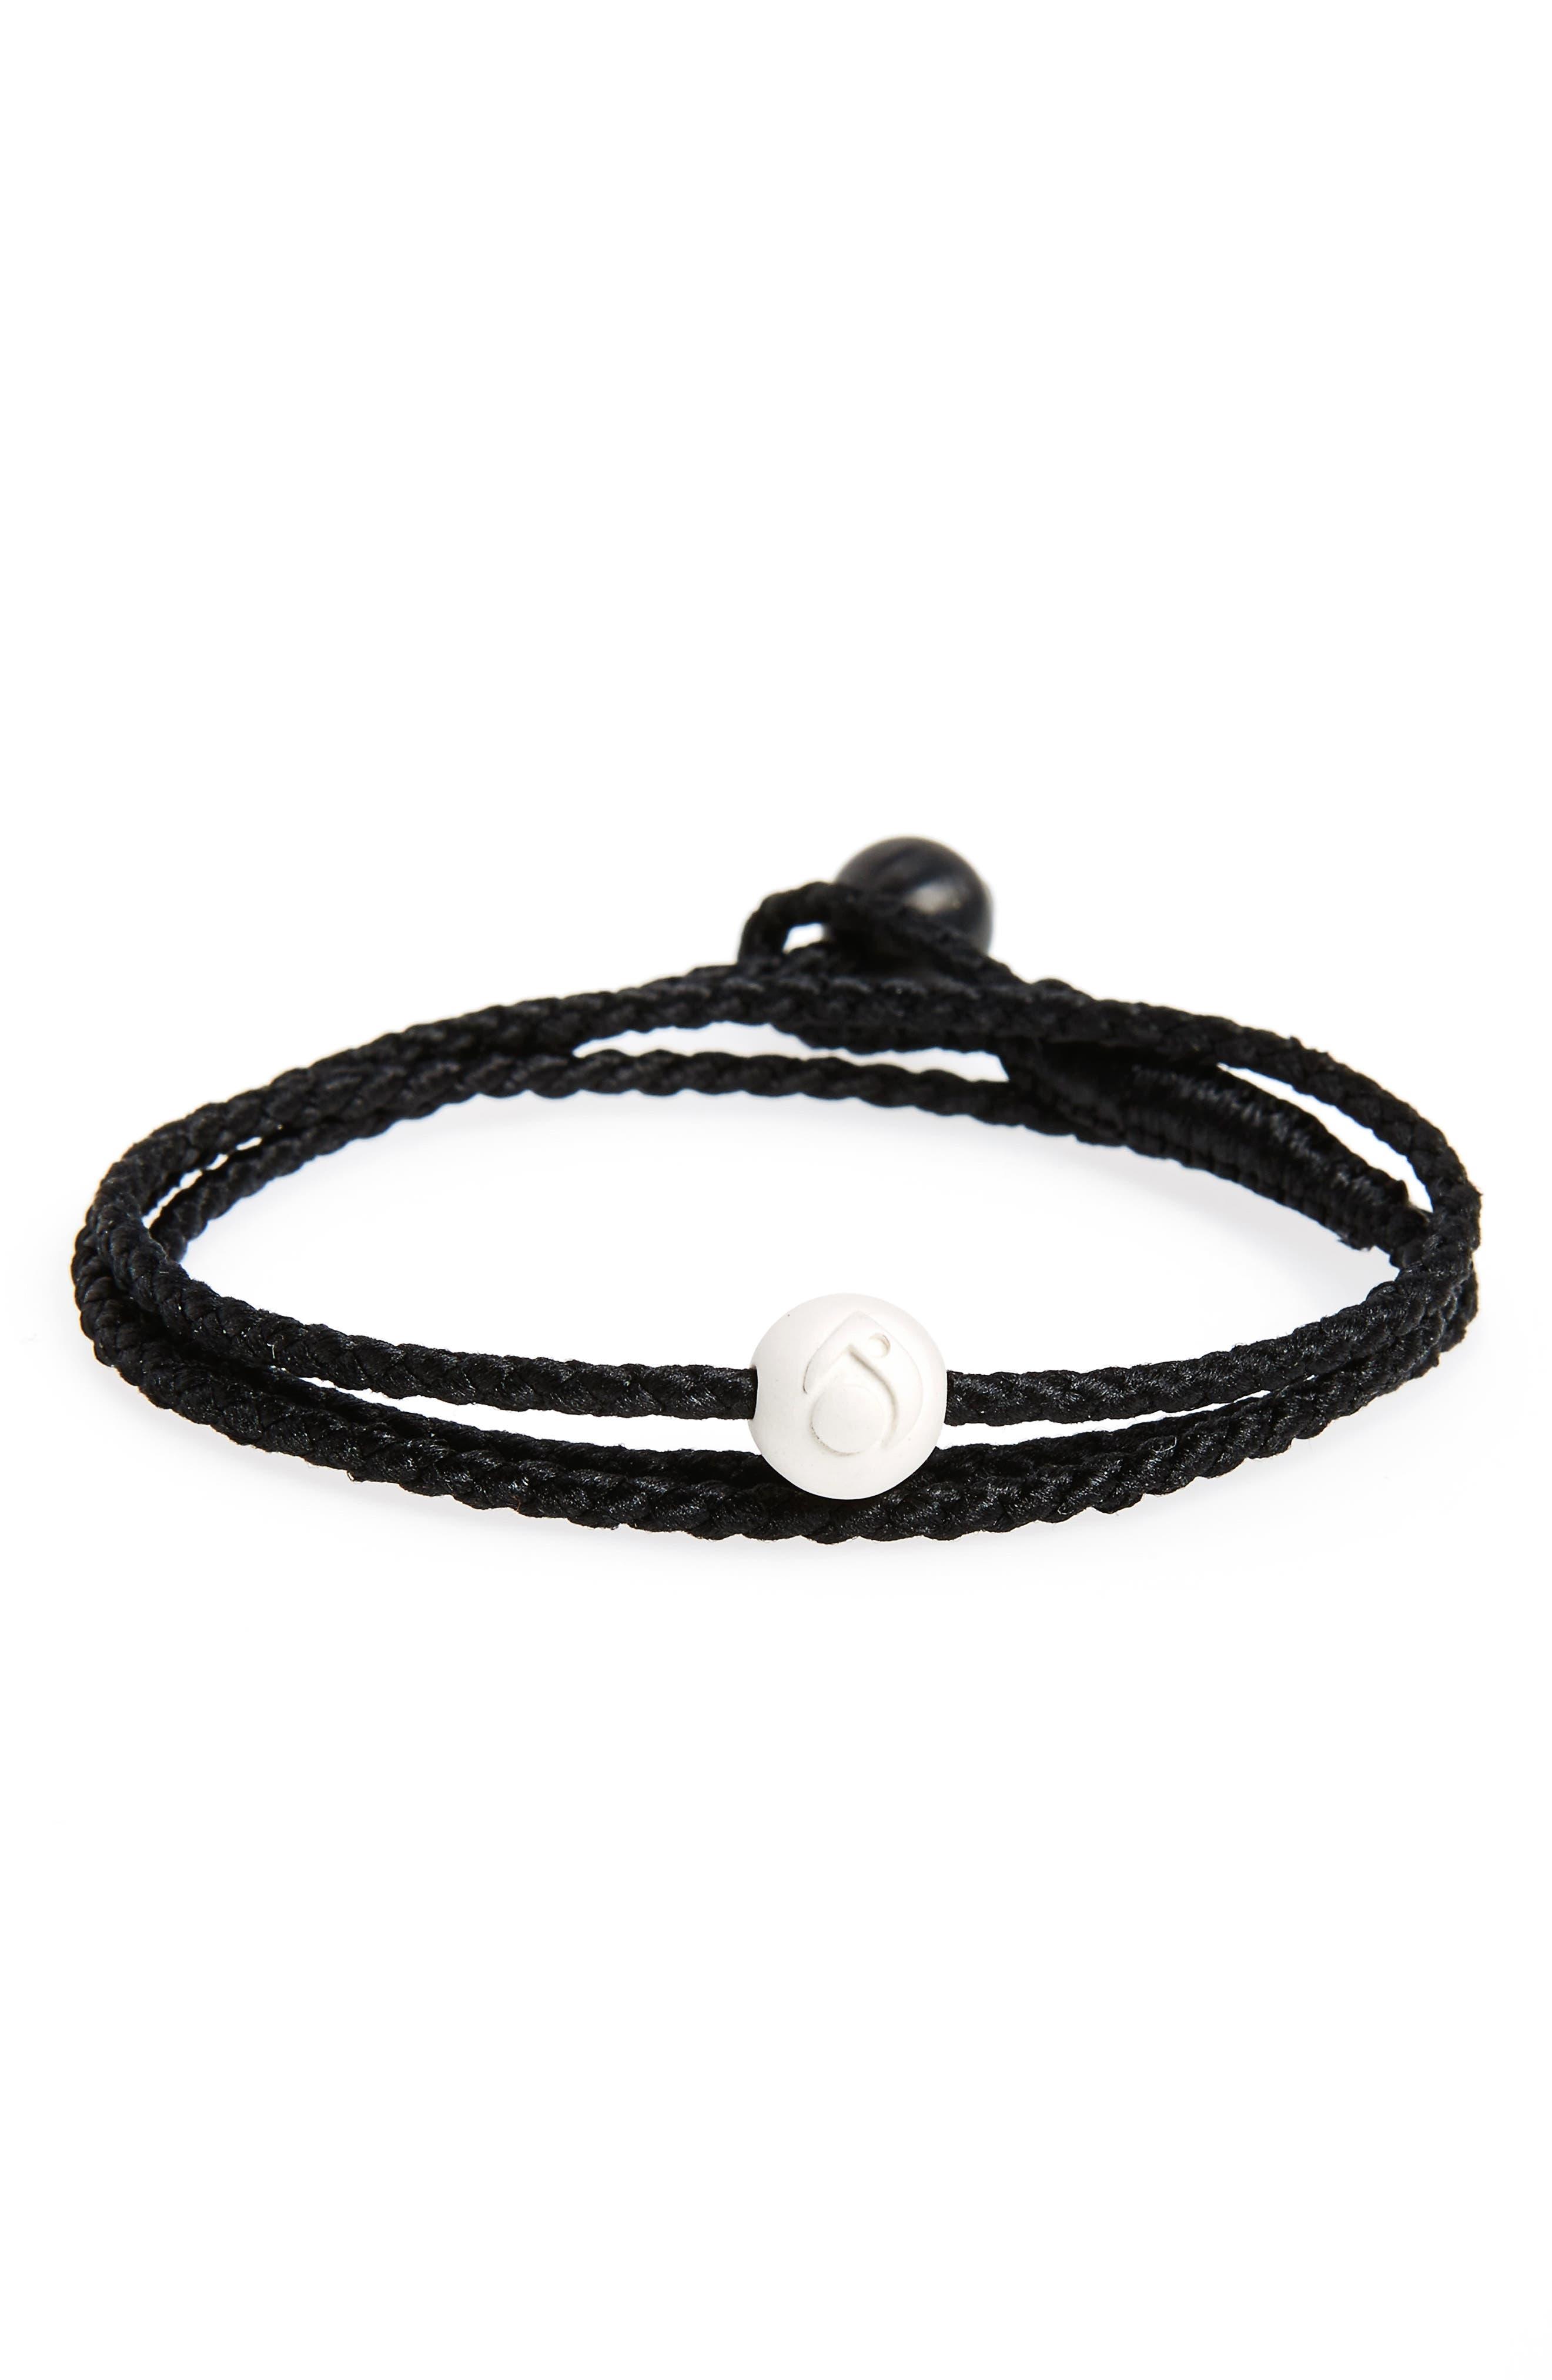 Triple Wrap Bracelet,                             Main thumbnail 1, color,                             Black